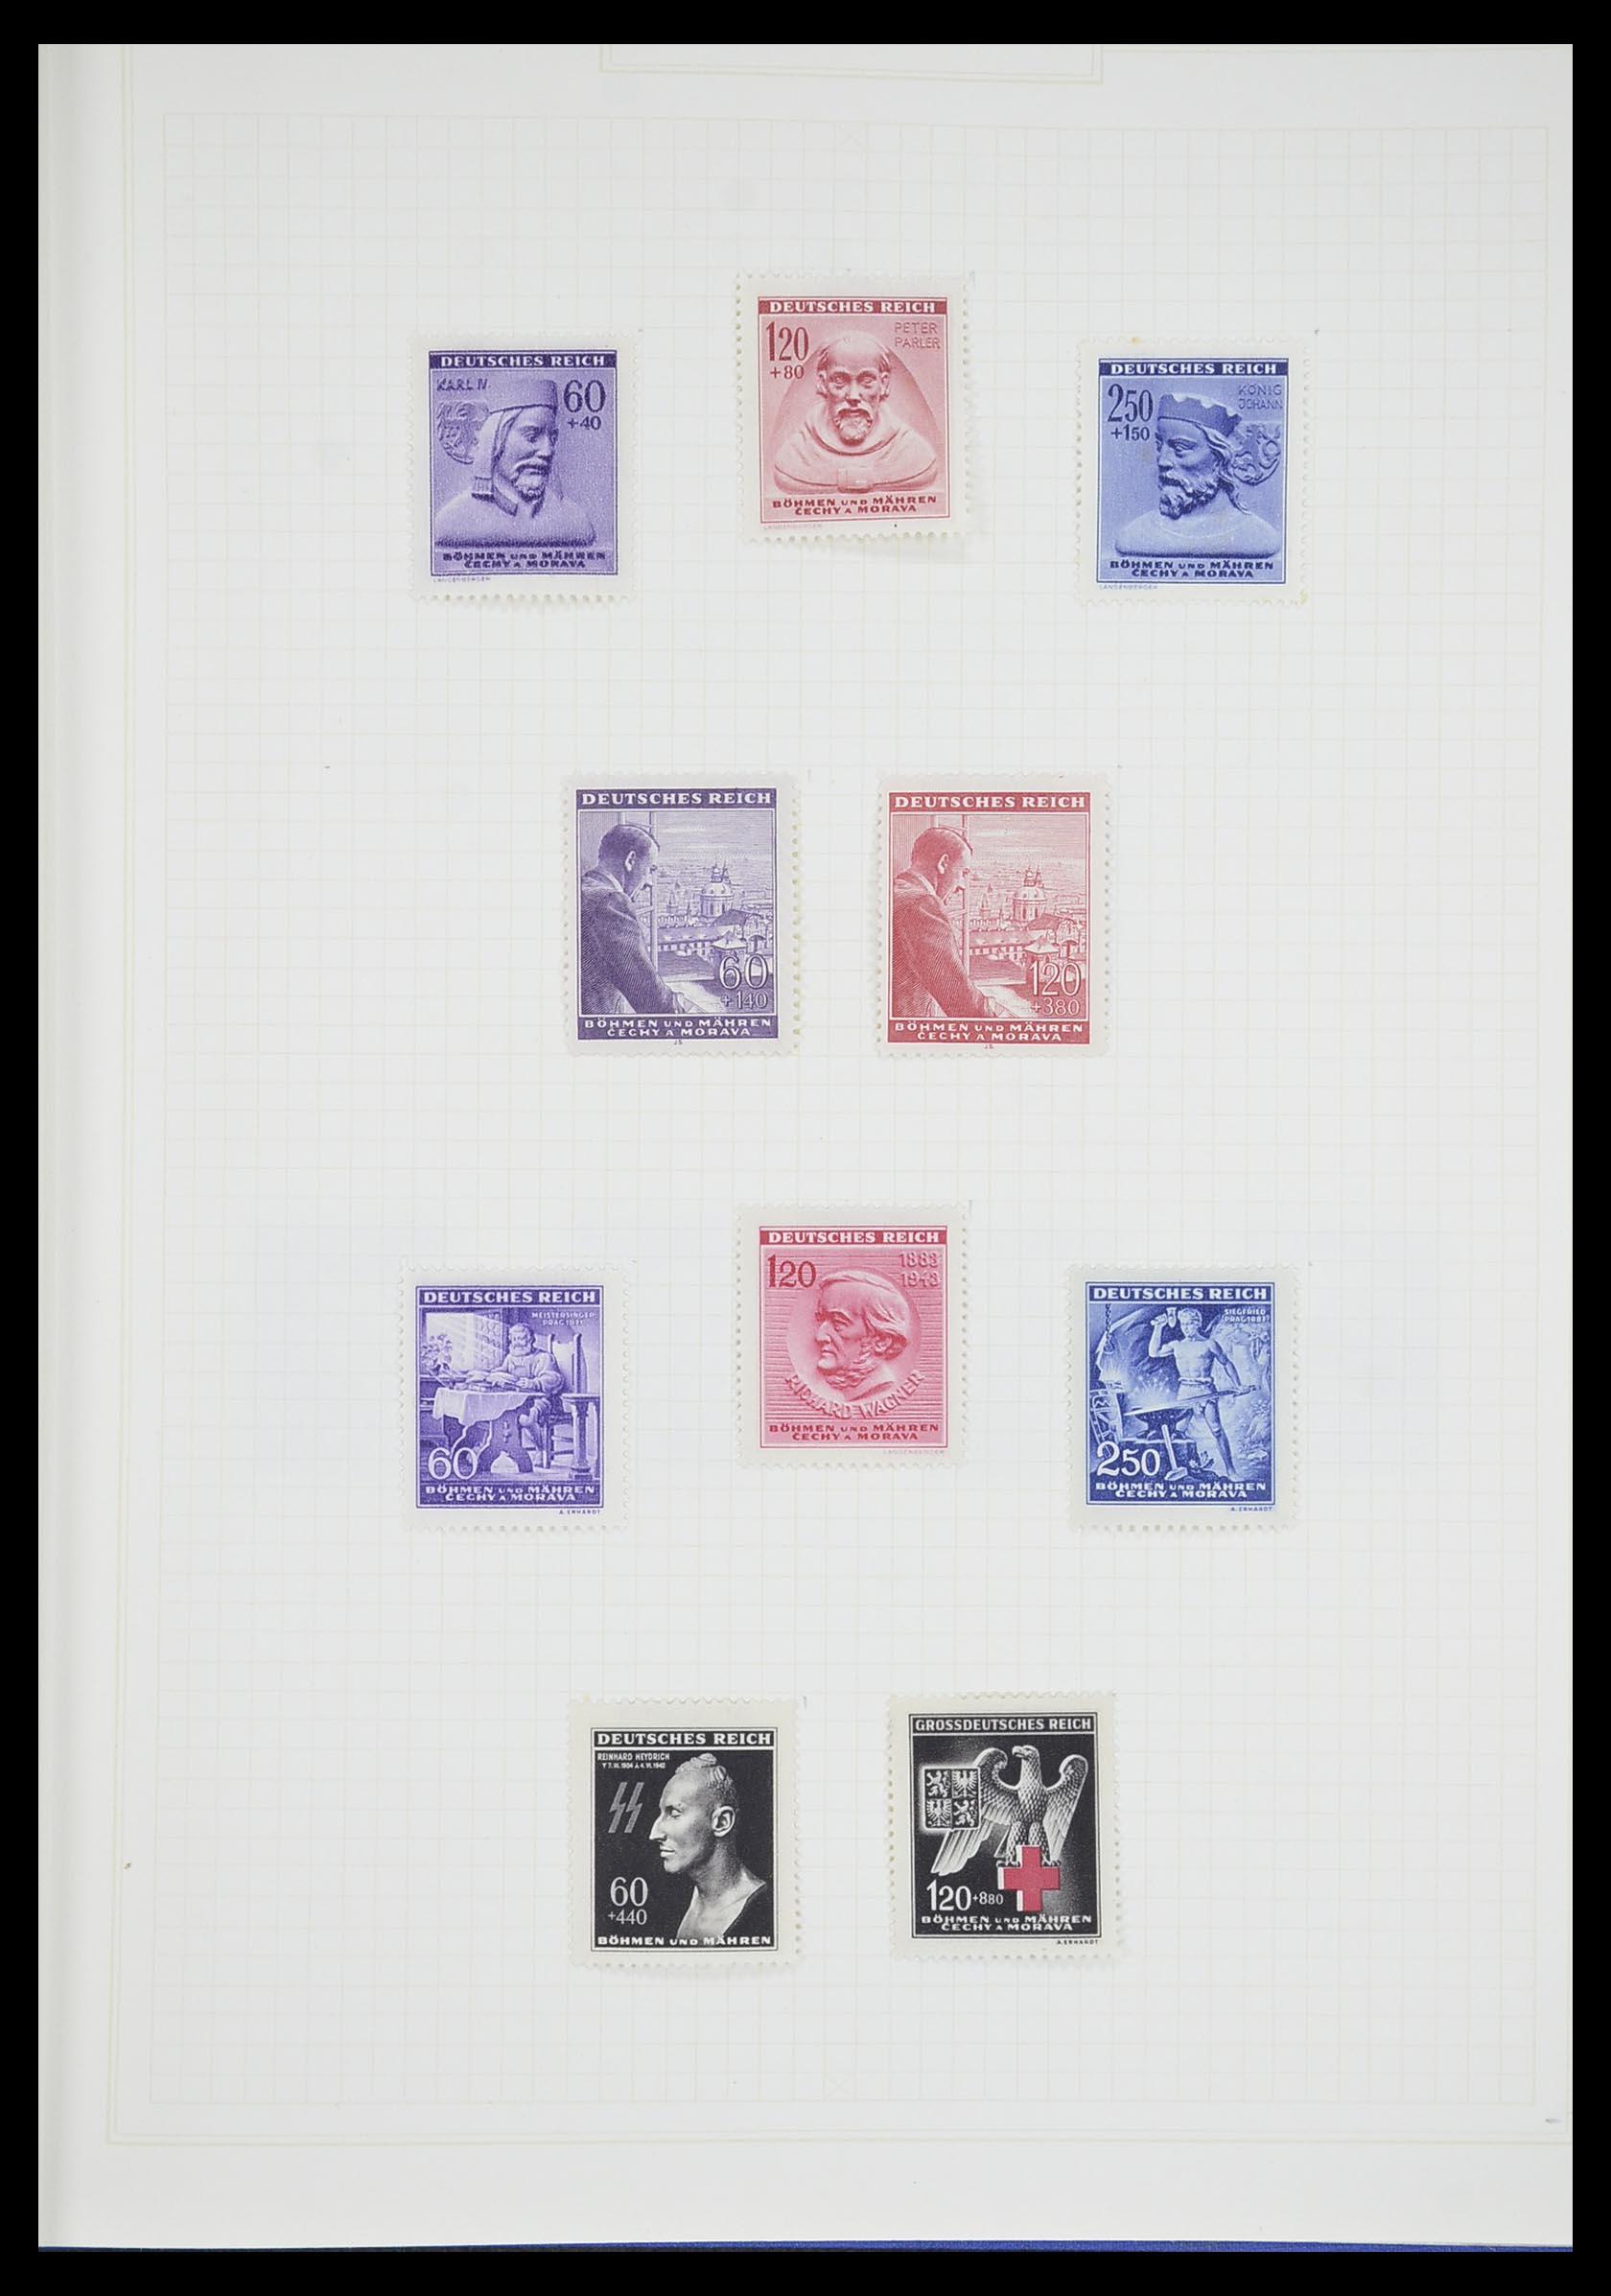 33713 019 - Postzegelverzameling 33713 Duitse bezettingen WO I en WO II 1914-1945